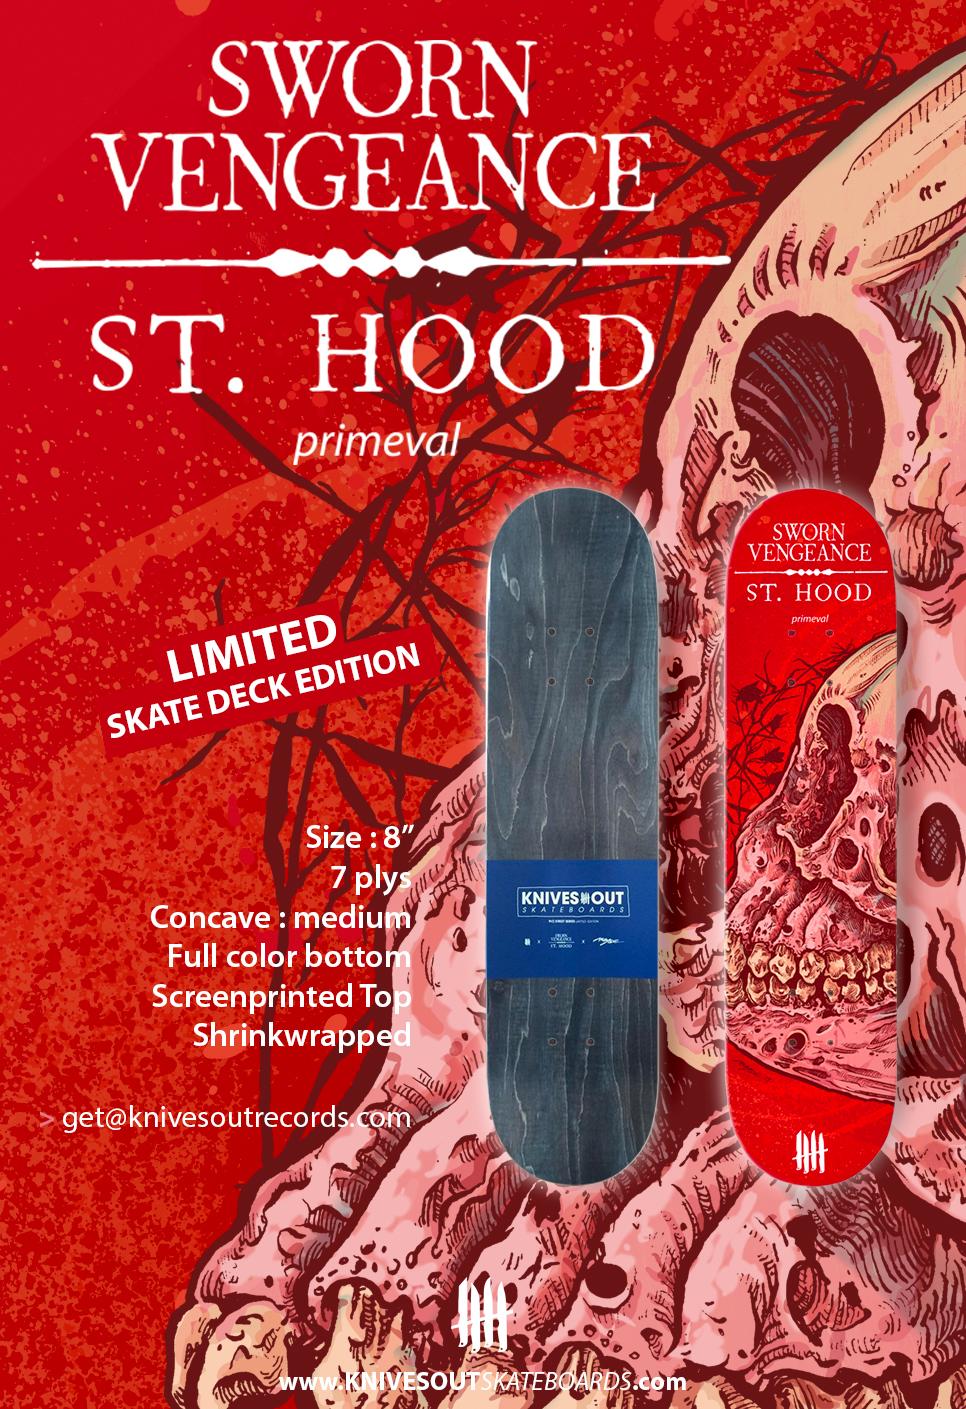 "SWORN VENGEANCE/ST HOOD ""Primeval"" limited skate deck edition"